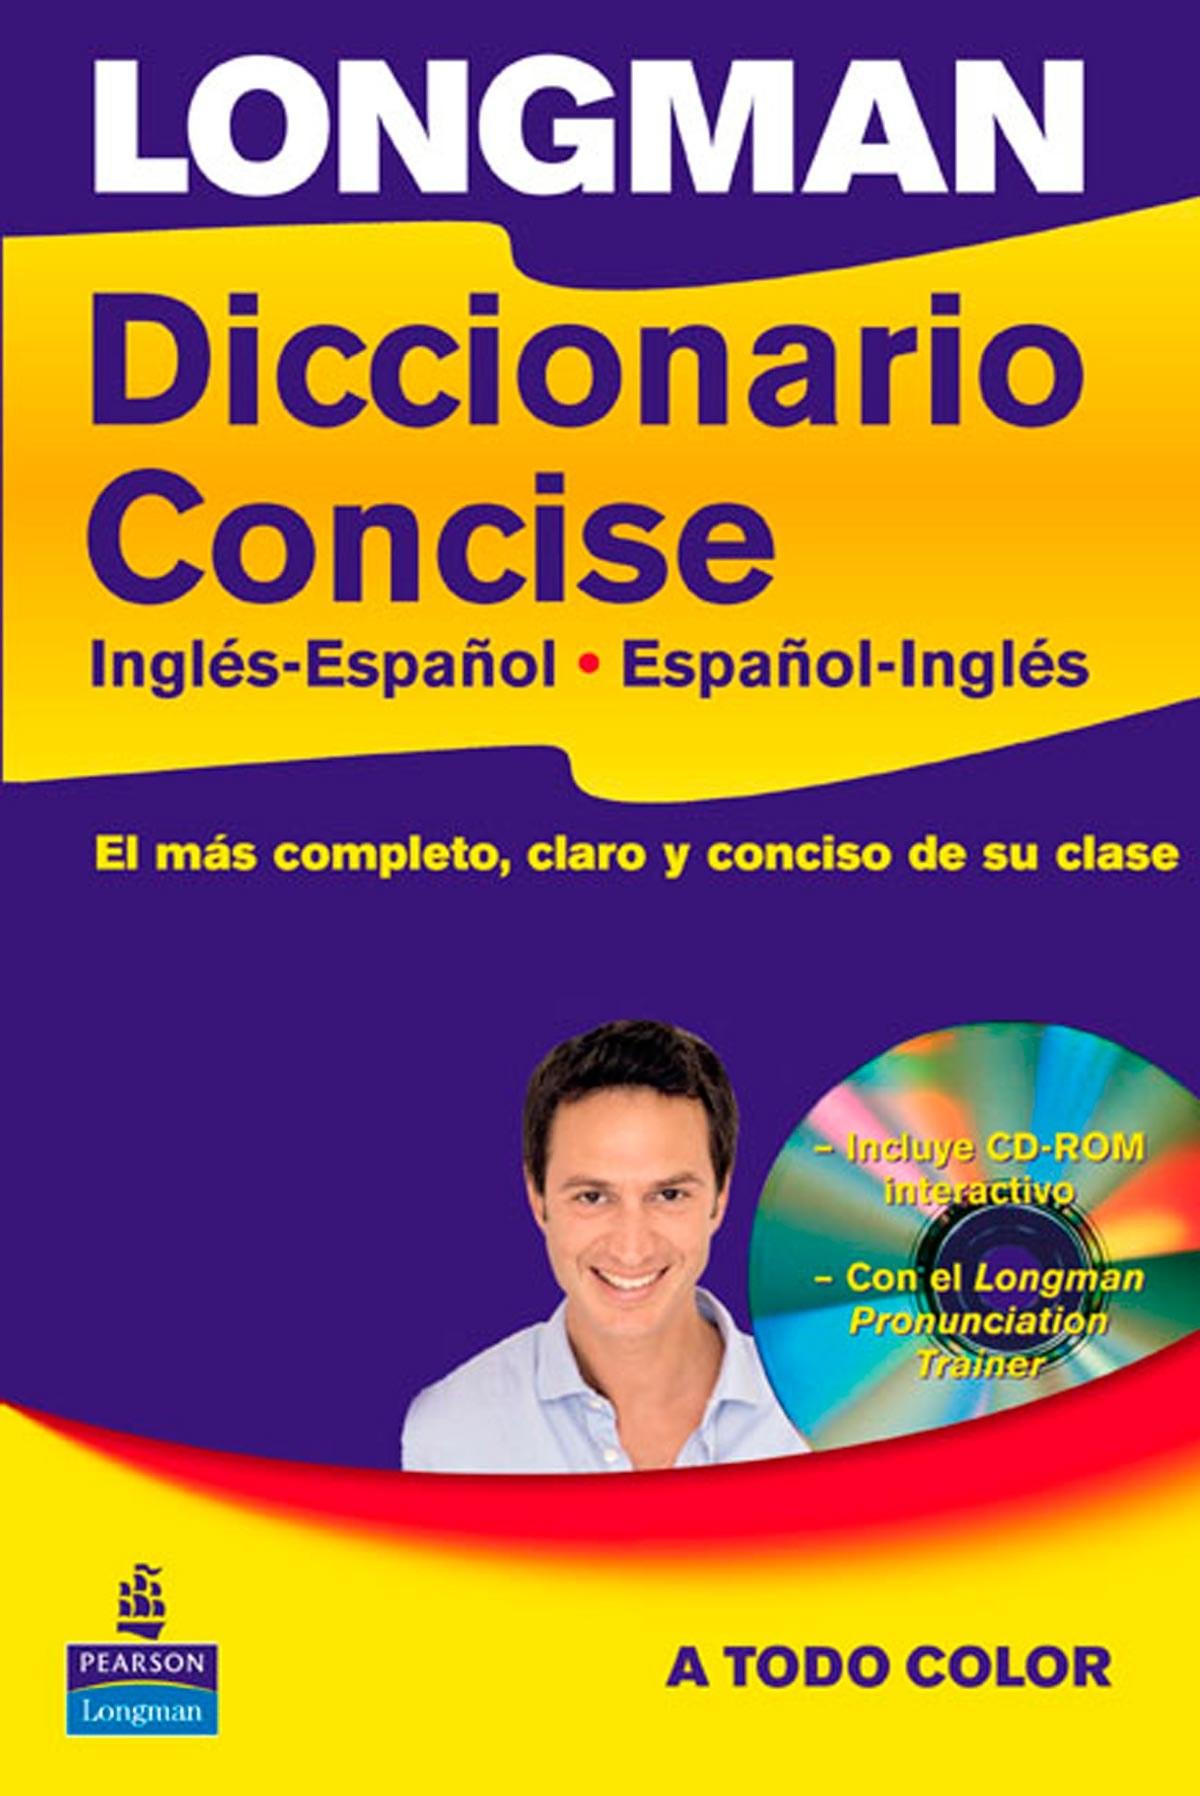 Longman diccionario Concise ingles-español/ español-ingles 9781405831505